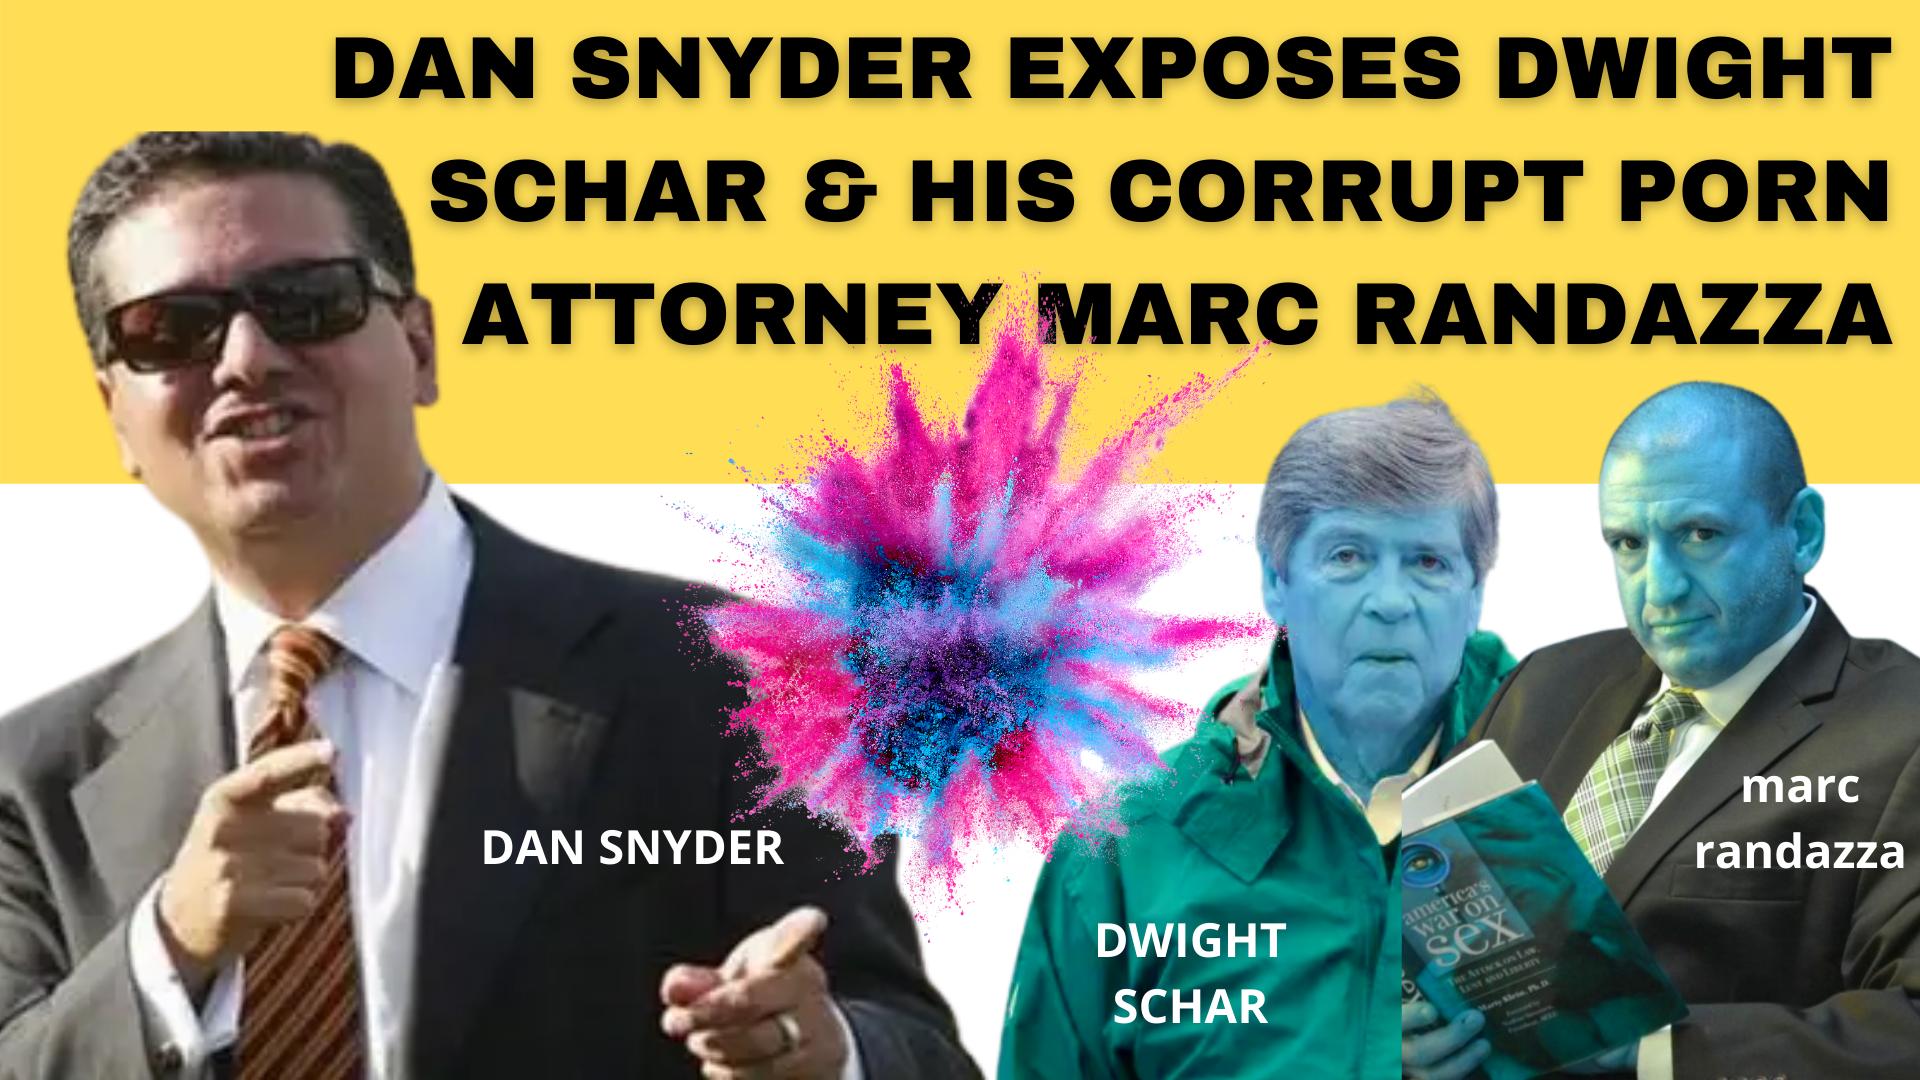 _Dan Snyder, Don Juravin and Richard Arrighi EXPOSE Dwight Schar and his porn corrupt attonrey Marc Randazza